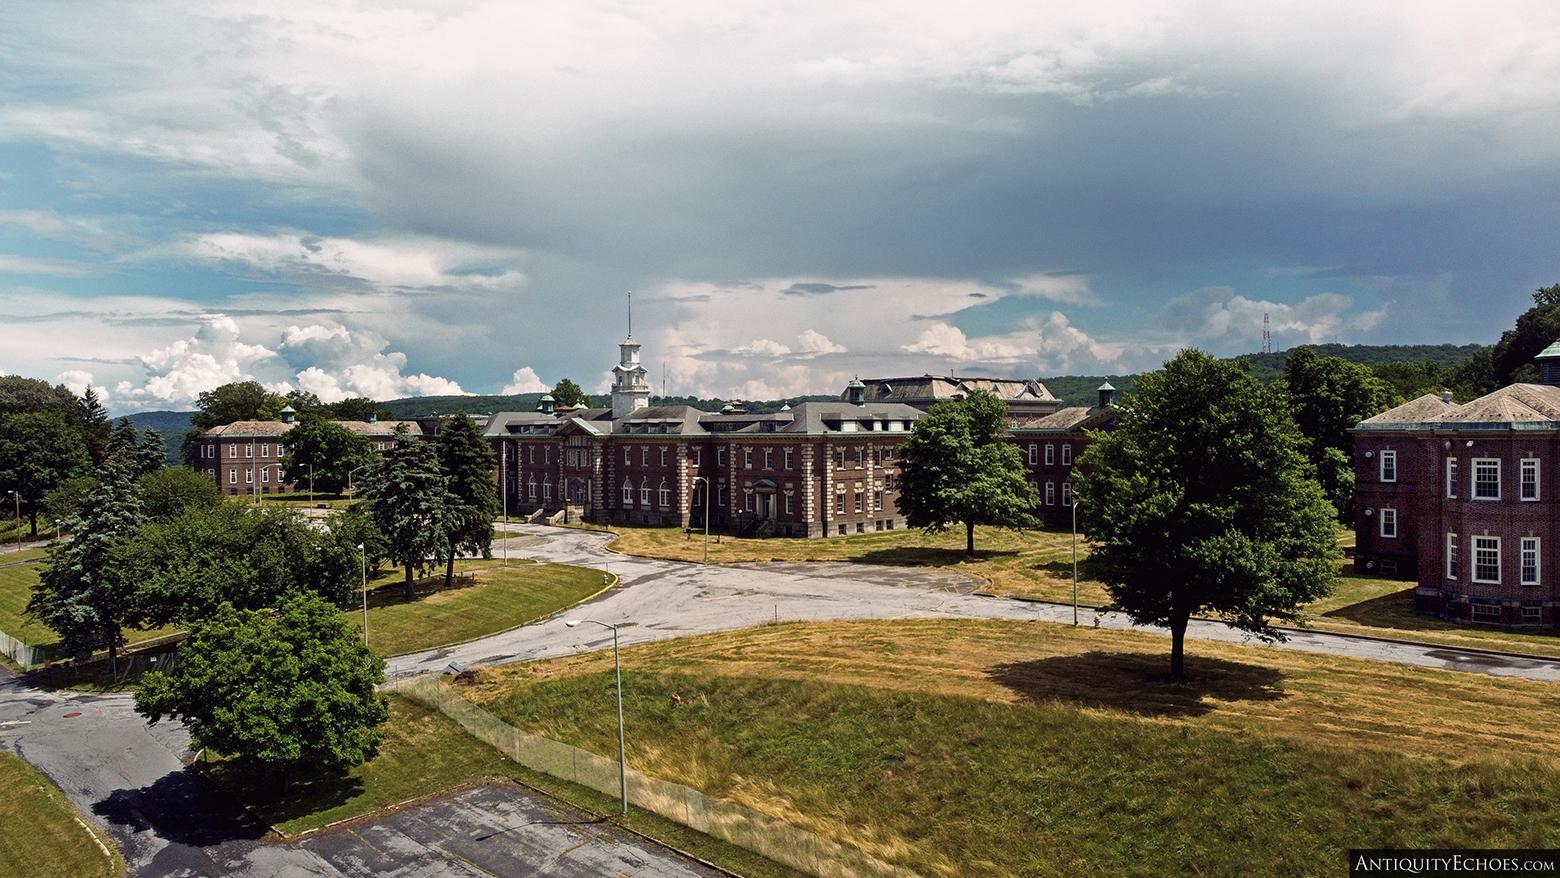 Allentown State Hospital - In Summer